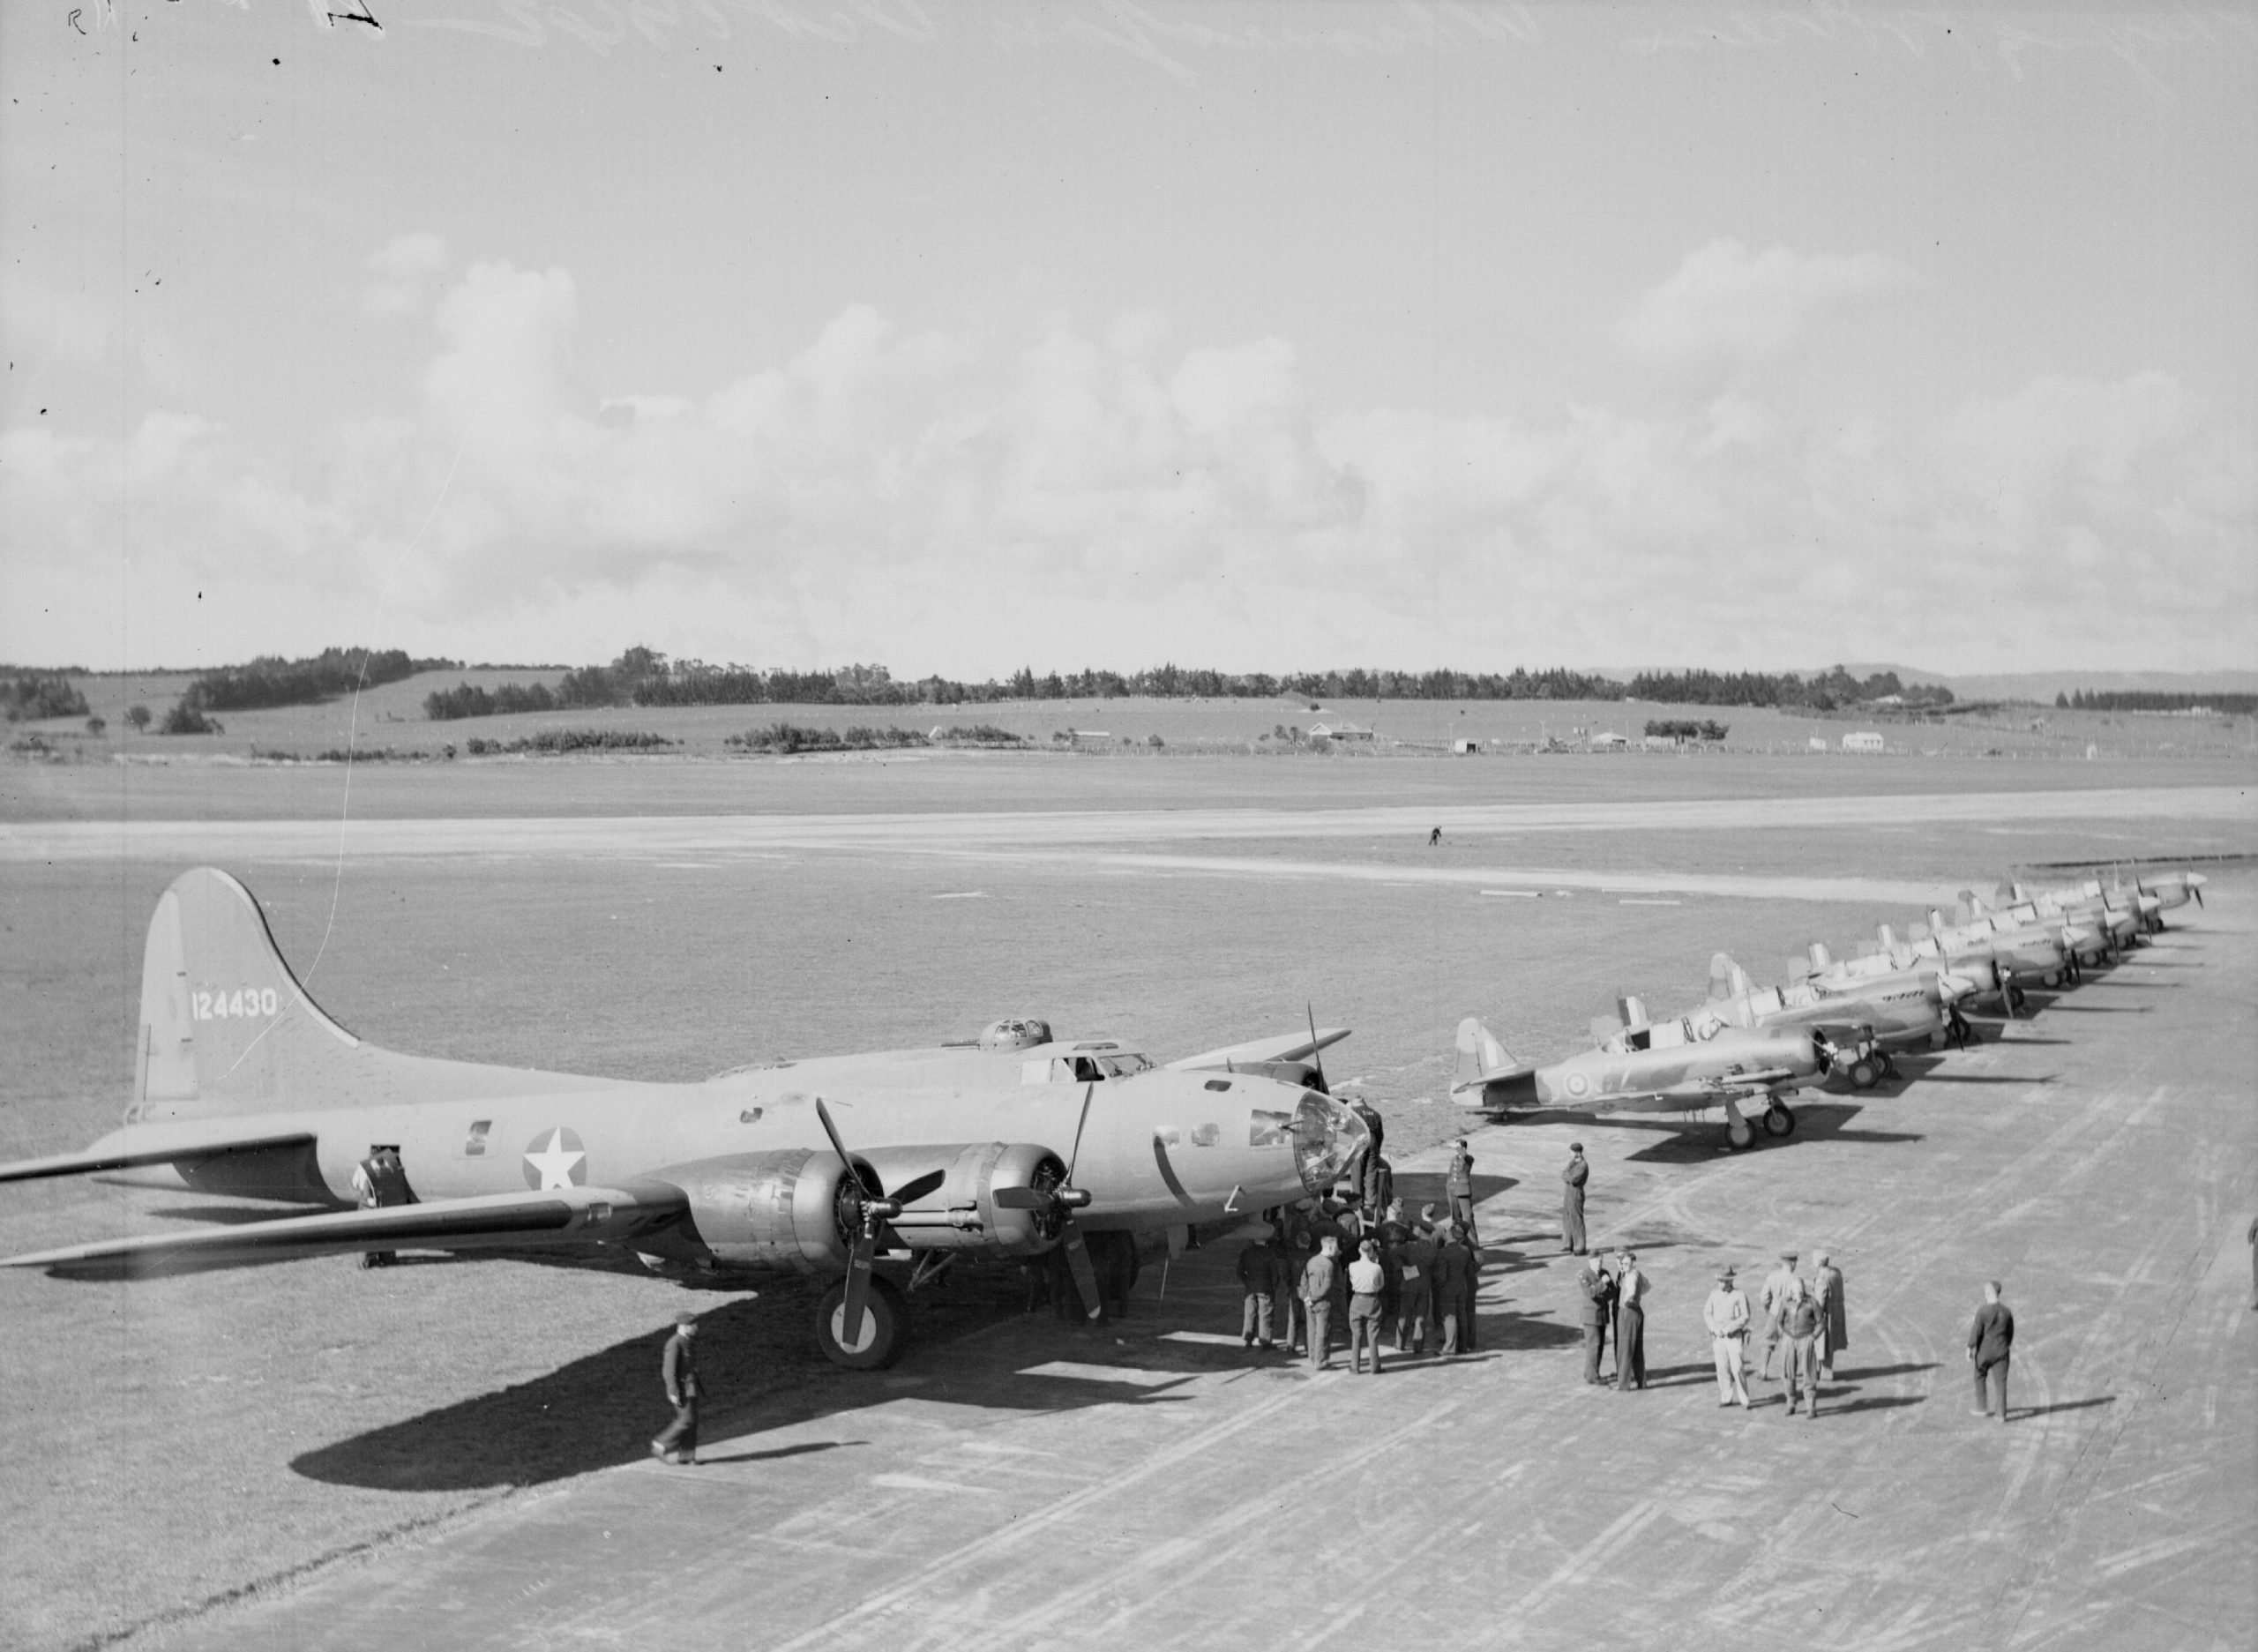 B-17 #41-24430